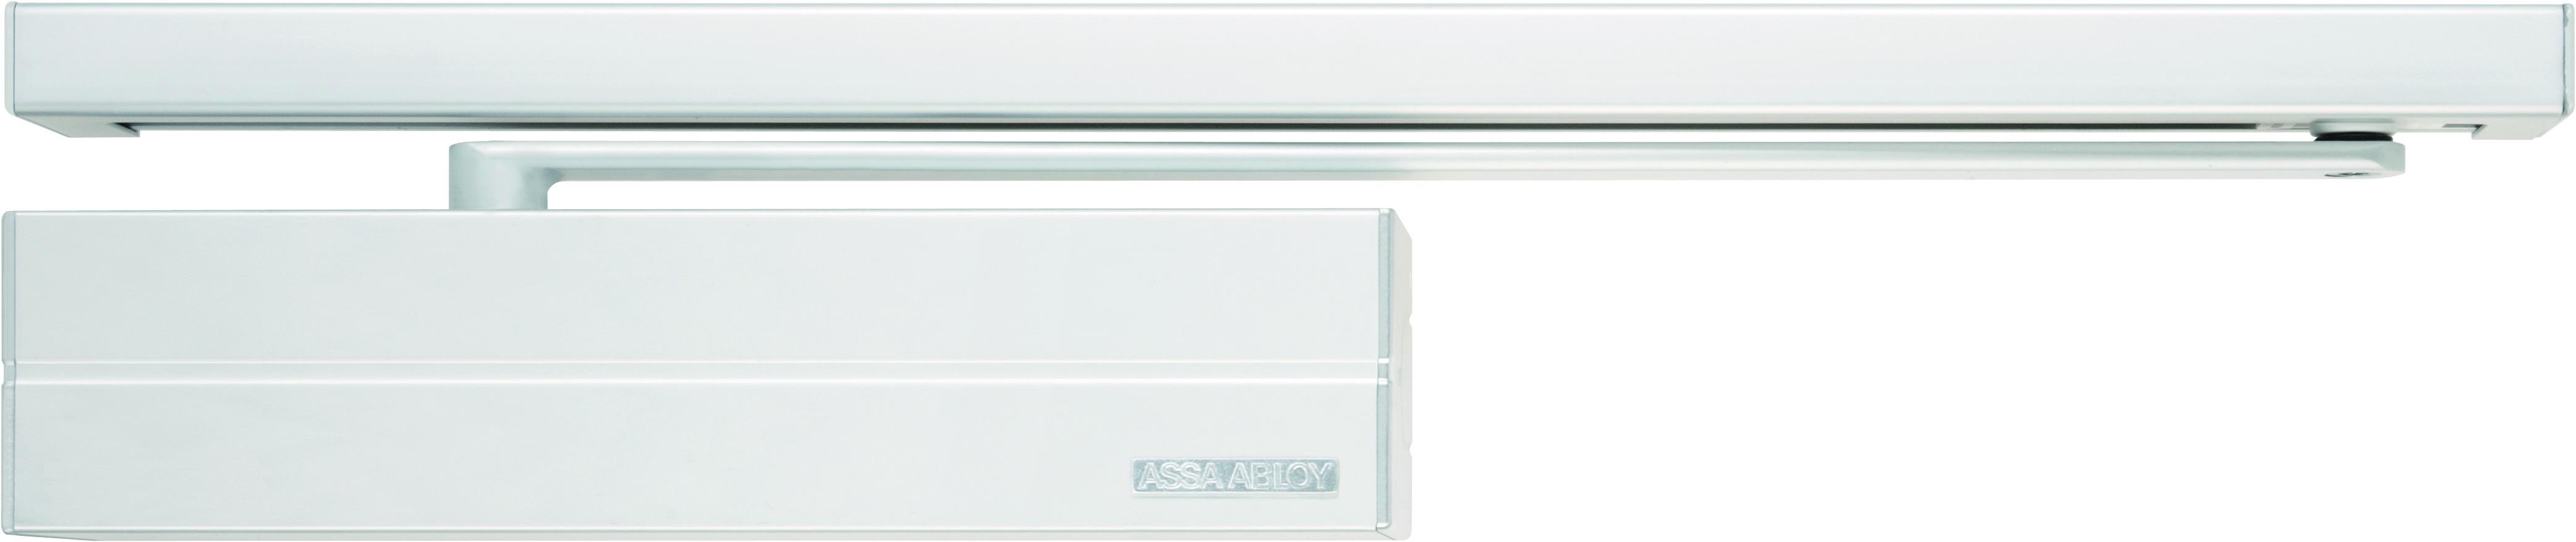 Assa Abloy Dc700 Guide Rail Door Closers Single Leaf